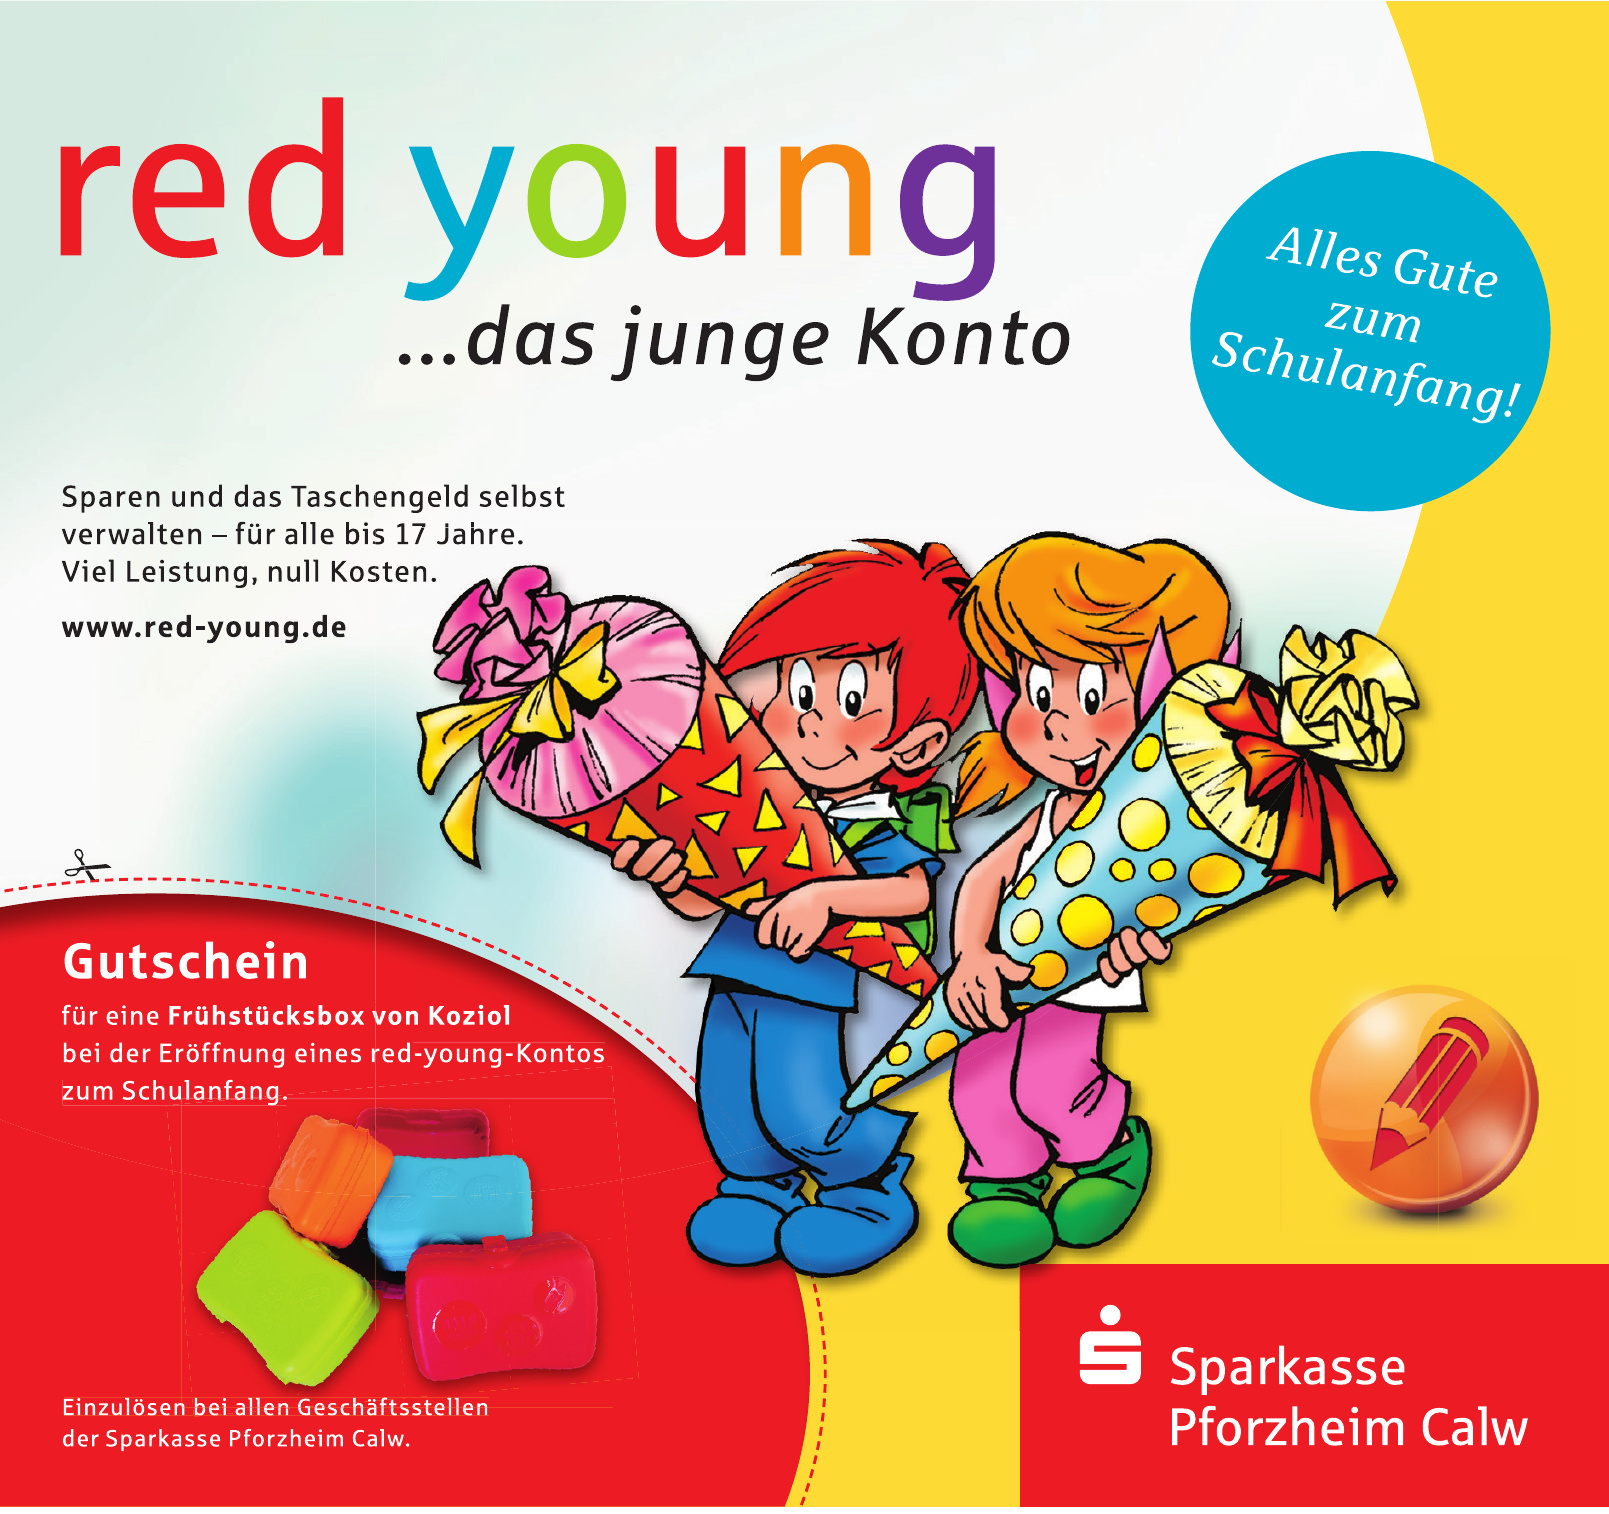 Sparkasse Pforzheim Calw - red young